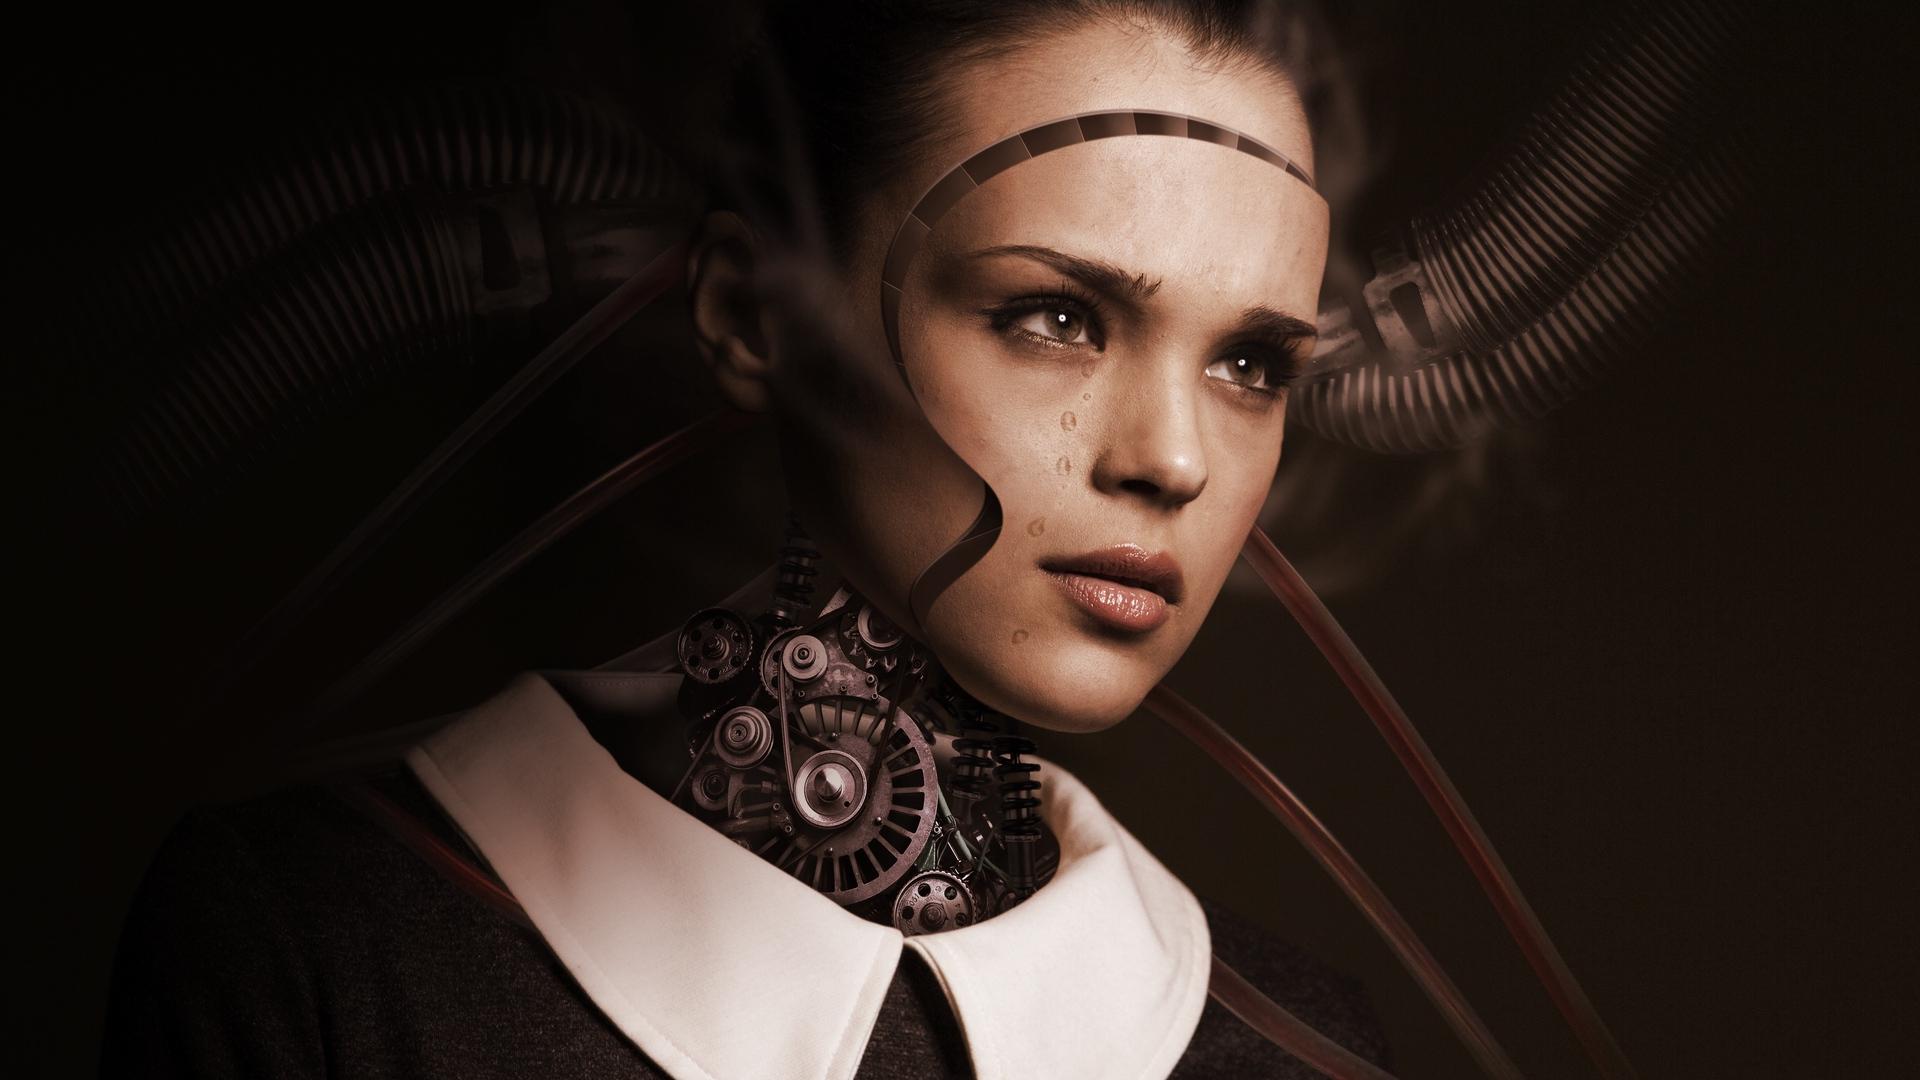 General 1920x1080 photo manipulation women cyborg tech face robot